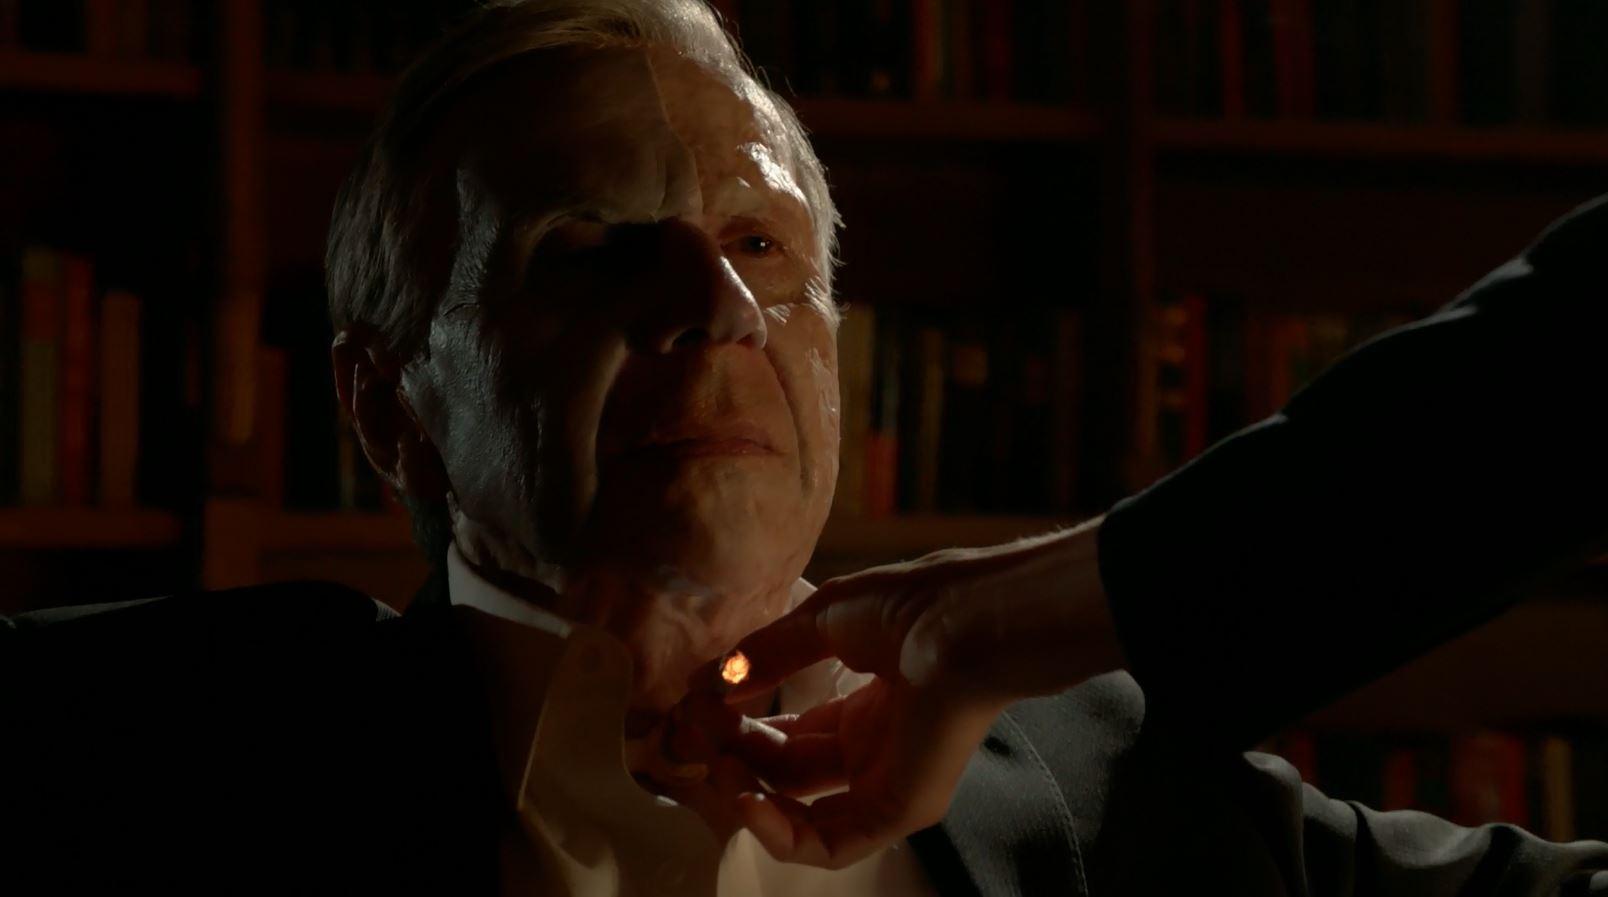 William B. Davis as Cigarette Smoking Man. The X-Files (miniseries) My Struggle Review